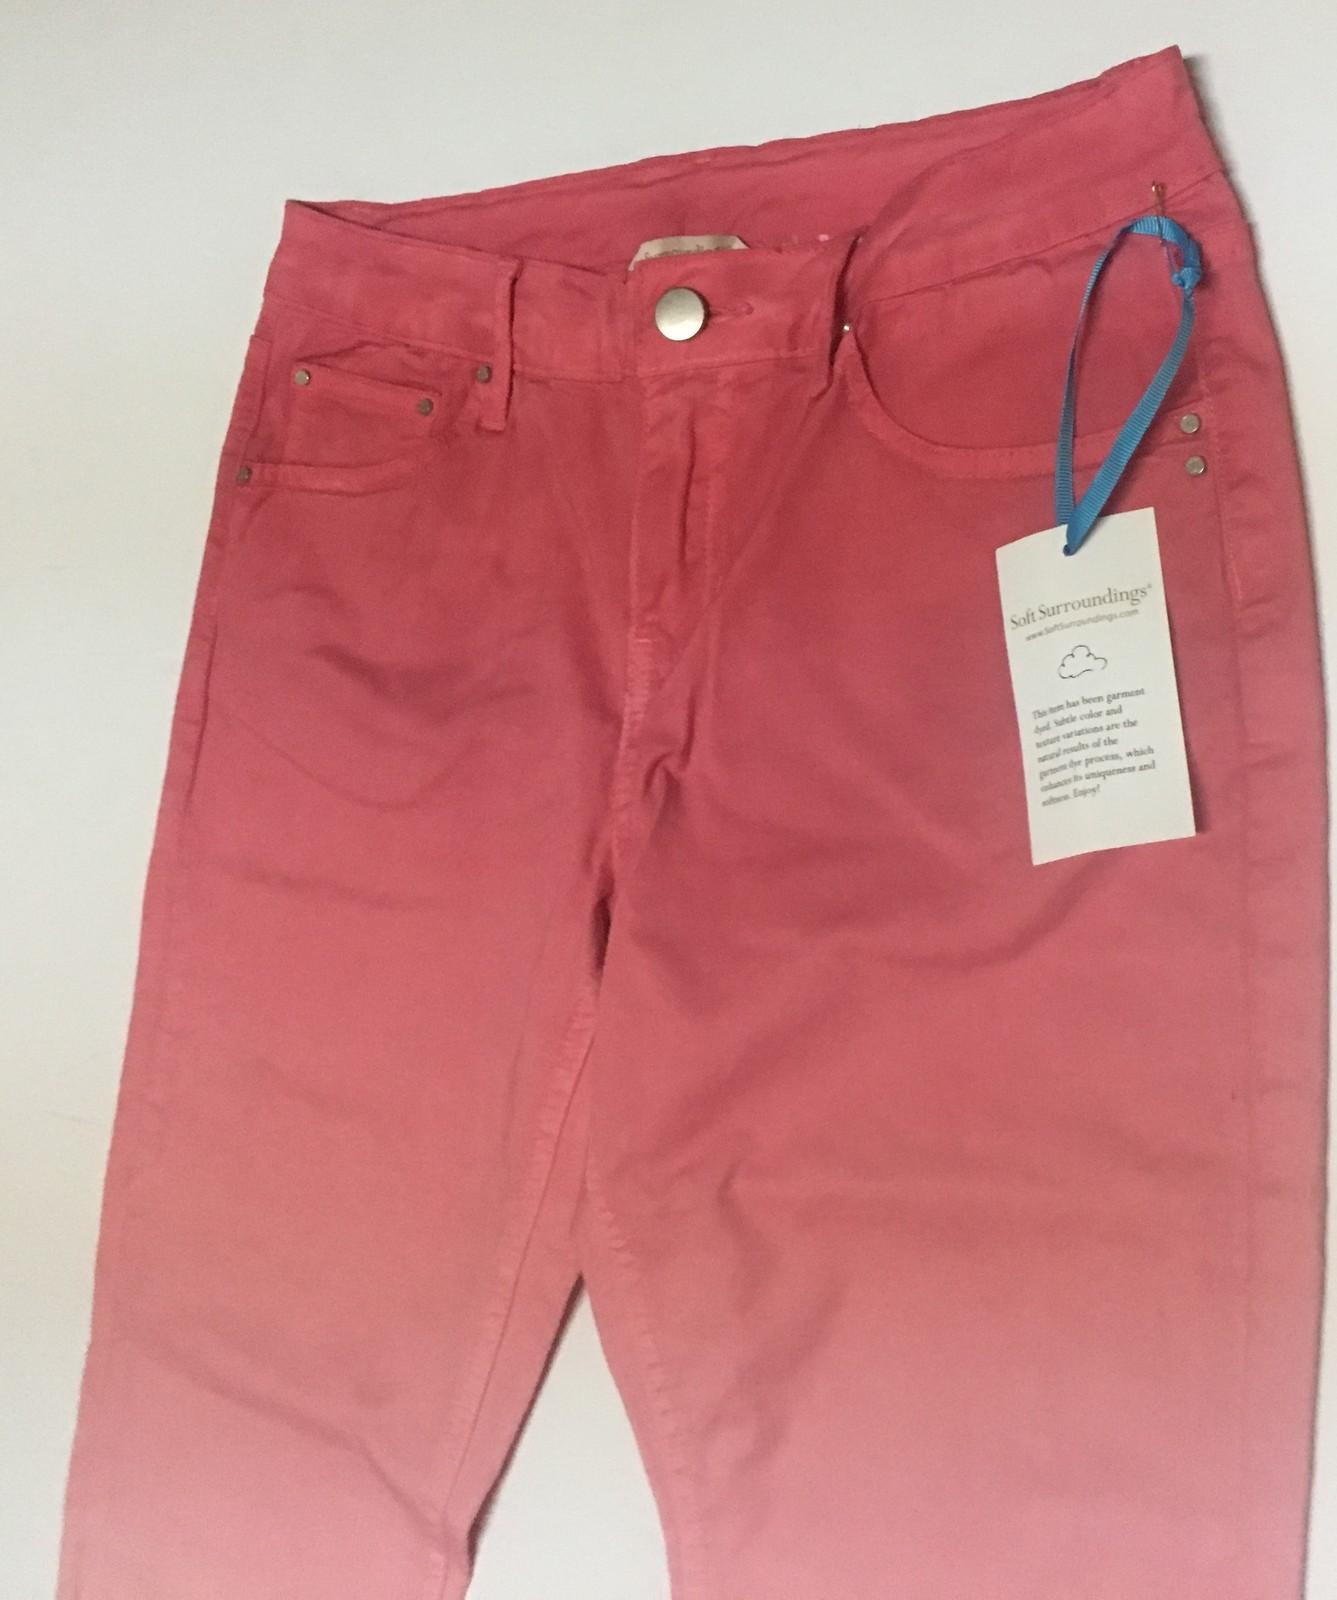 Soft Surroundings Pink Fade Jeans NWT Sz XS Zipper Legs